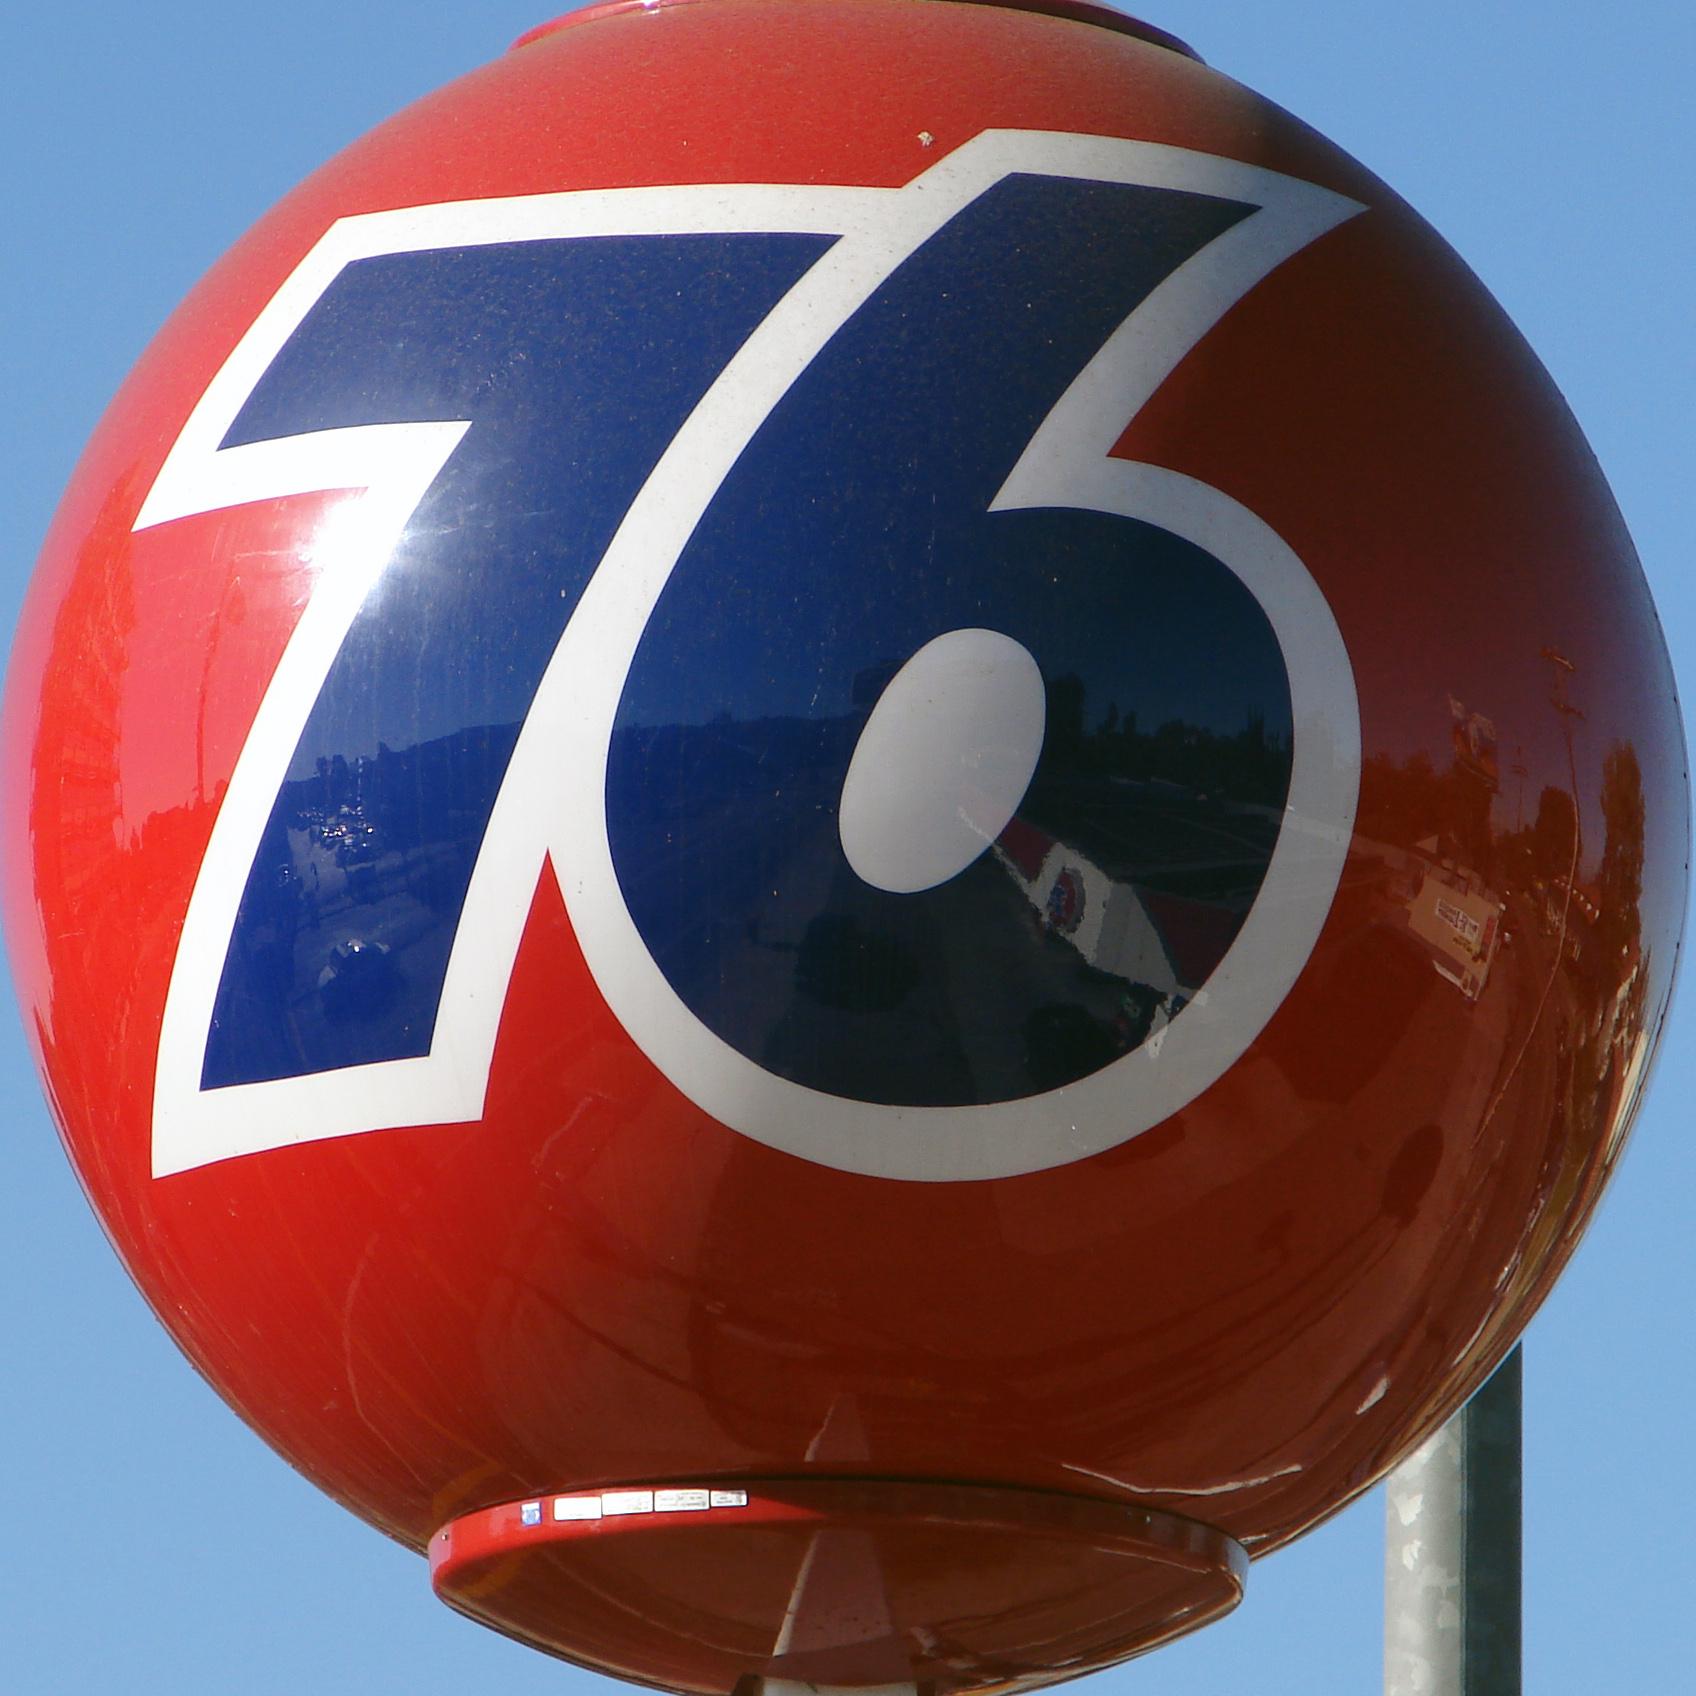 File:76 ball.jpg